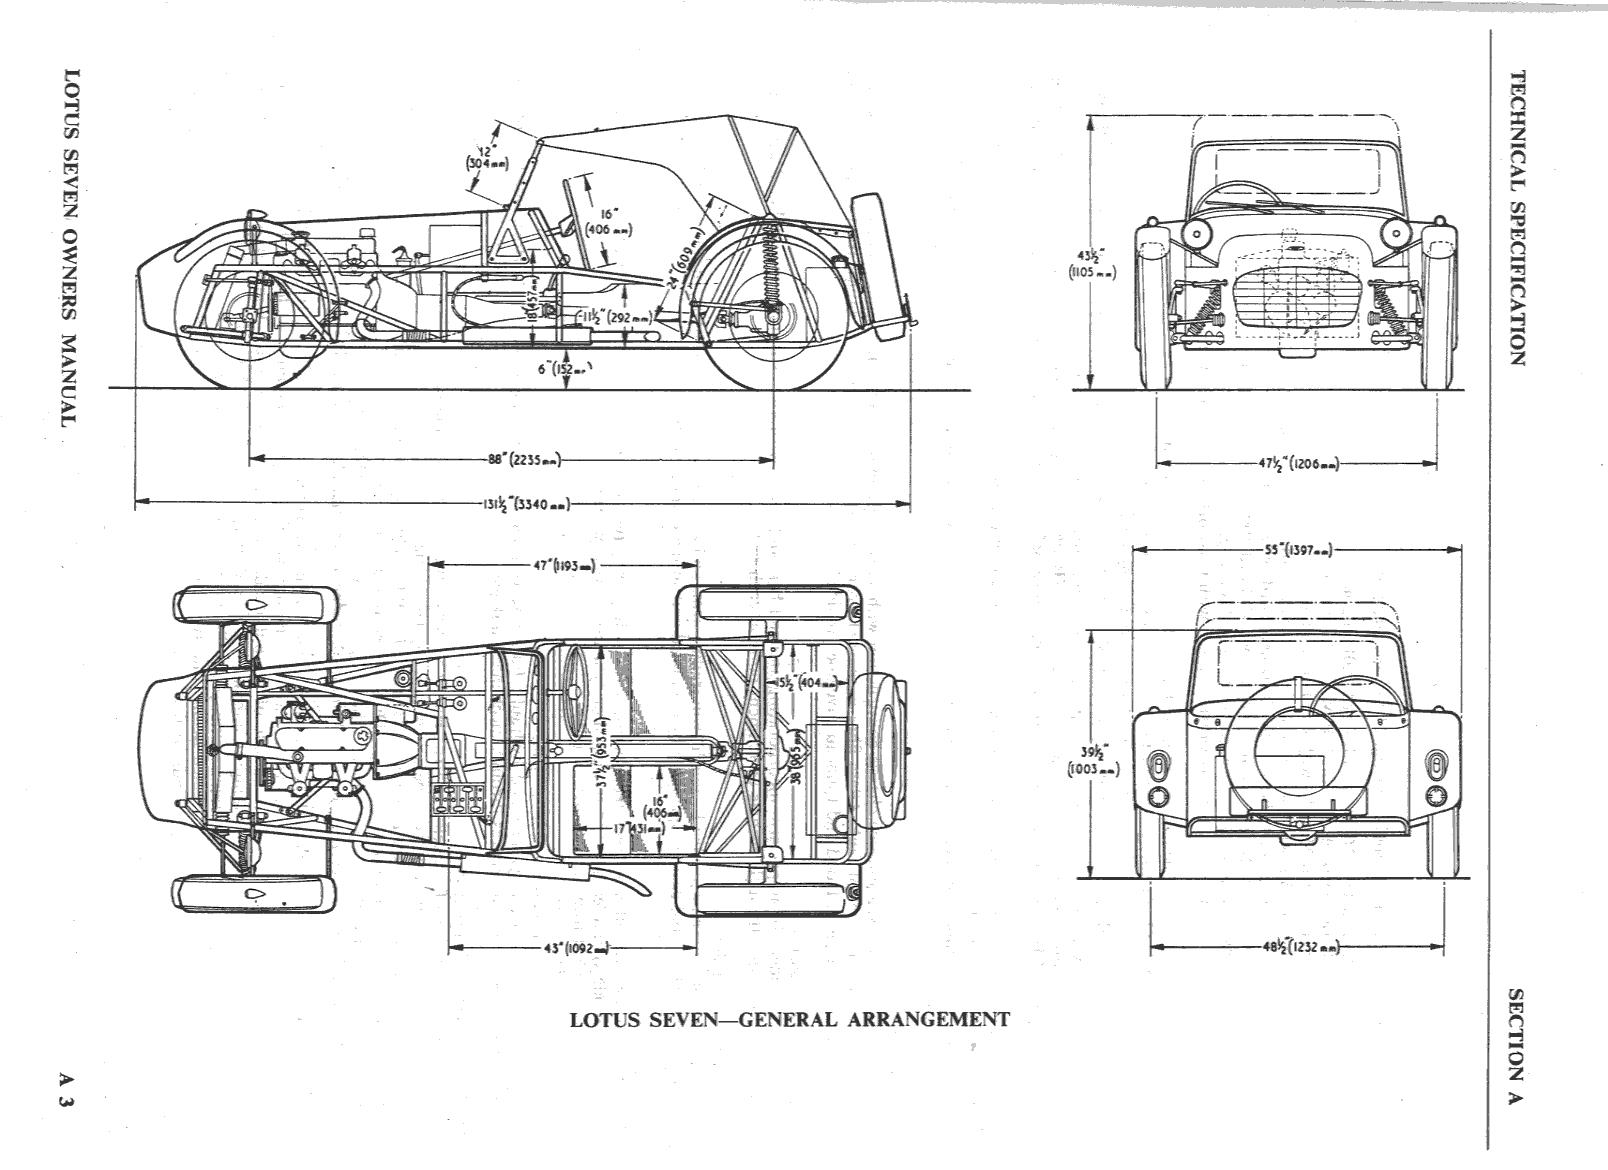 Lotus 7 Kit Car Usa - Mechanical engineering drawings drawings mechanical daydream